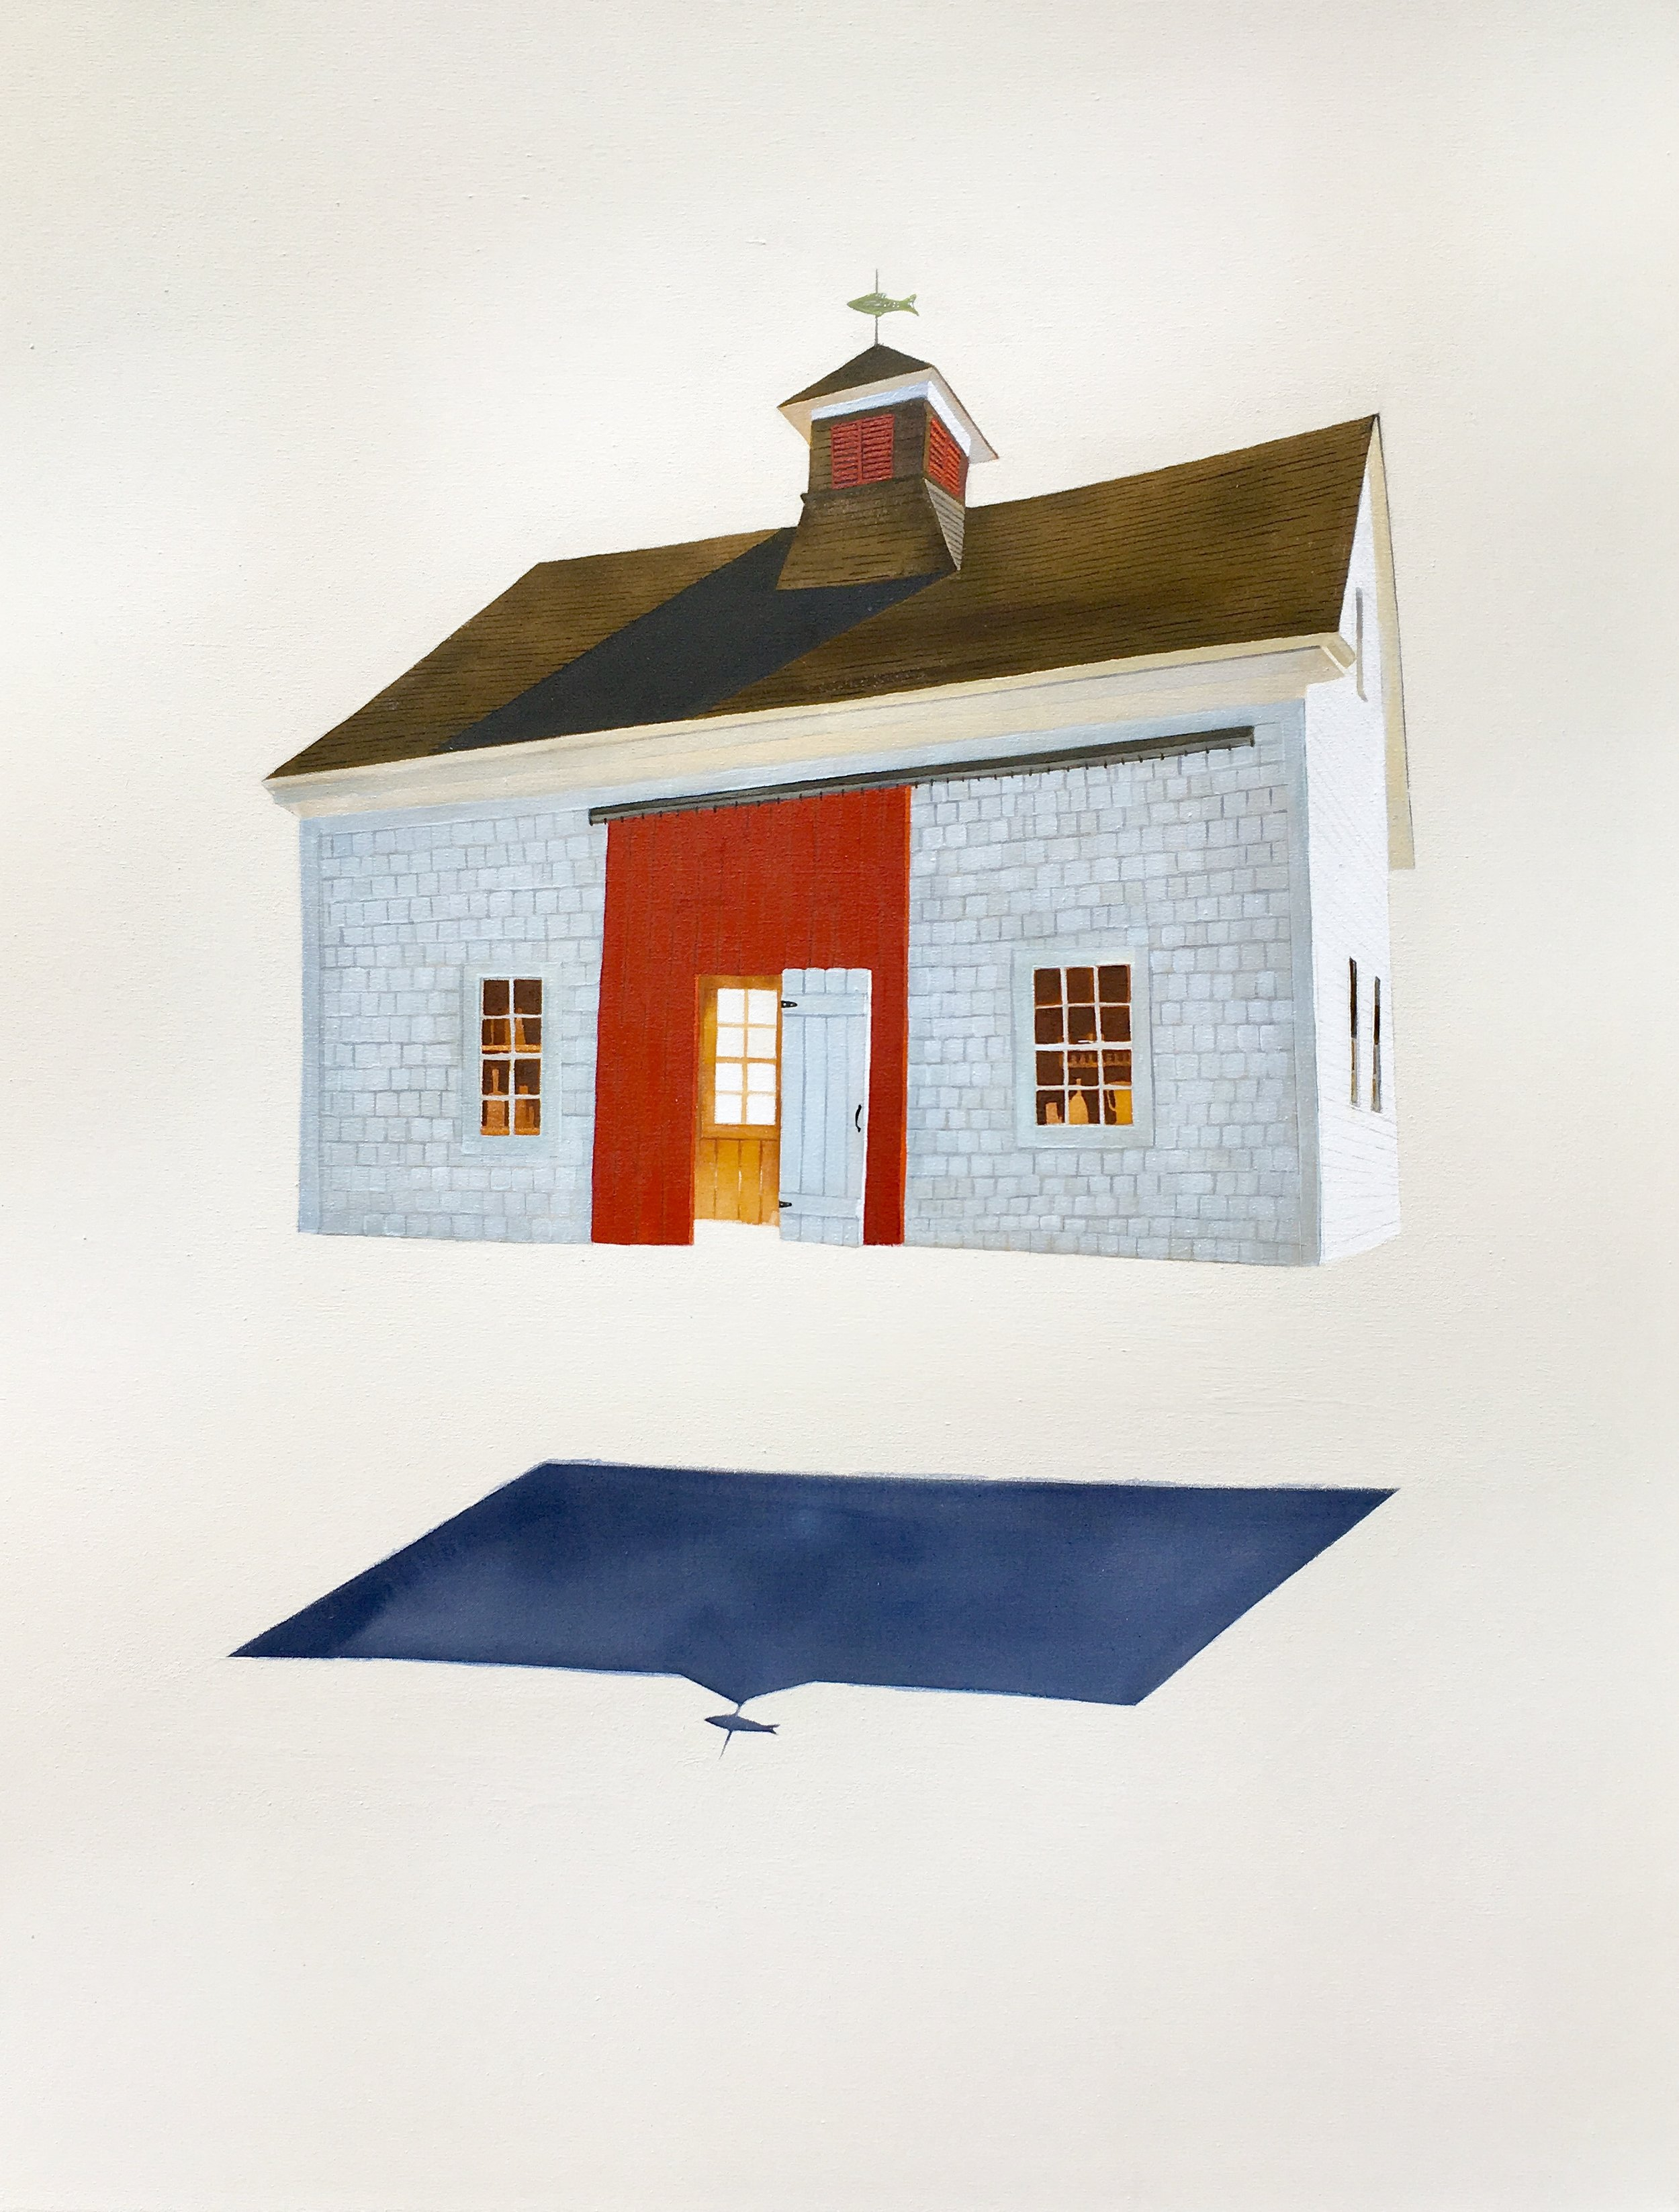 Traci Harmon-Hay,  Barn from the Past , Acrylic on raw canvas, 30x38